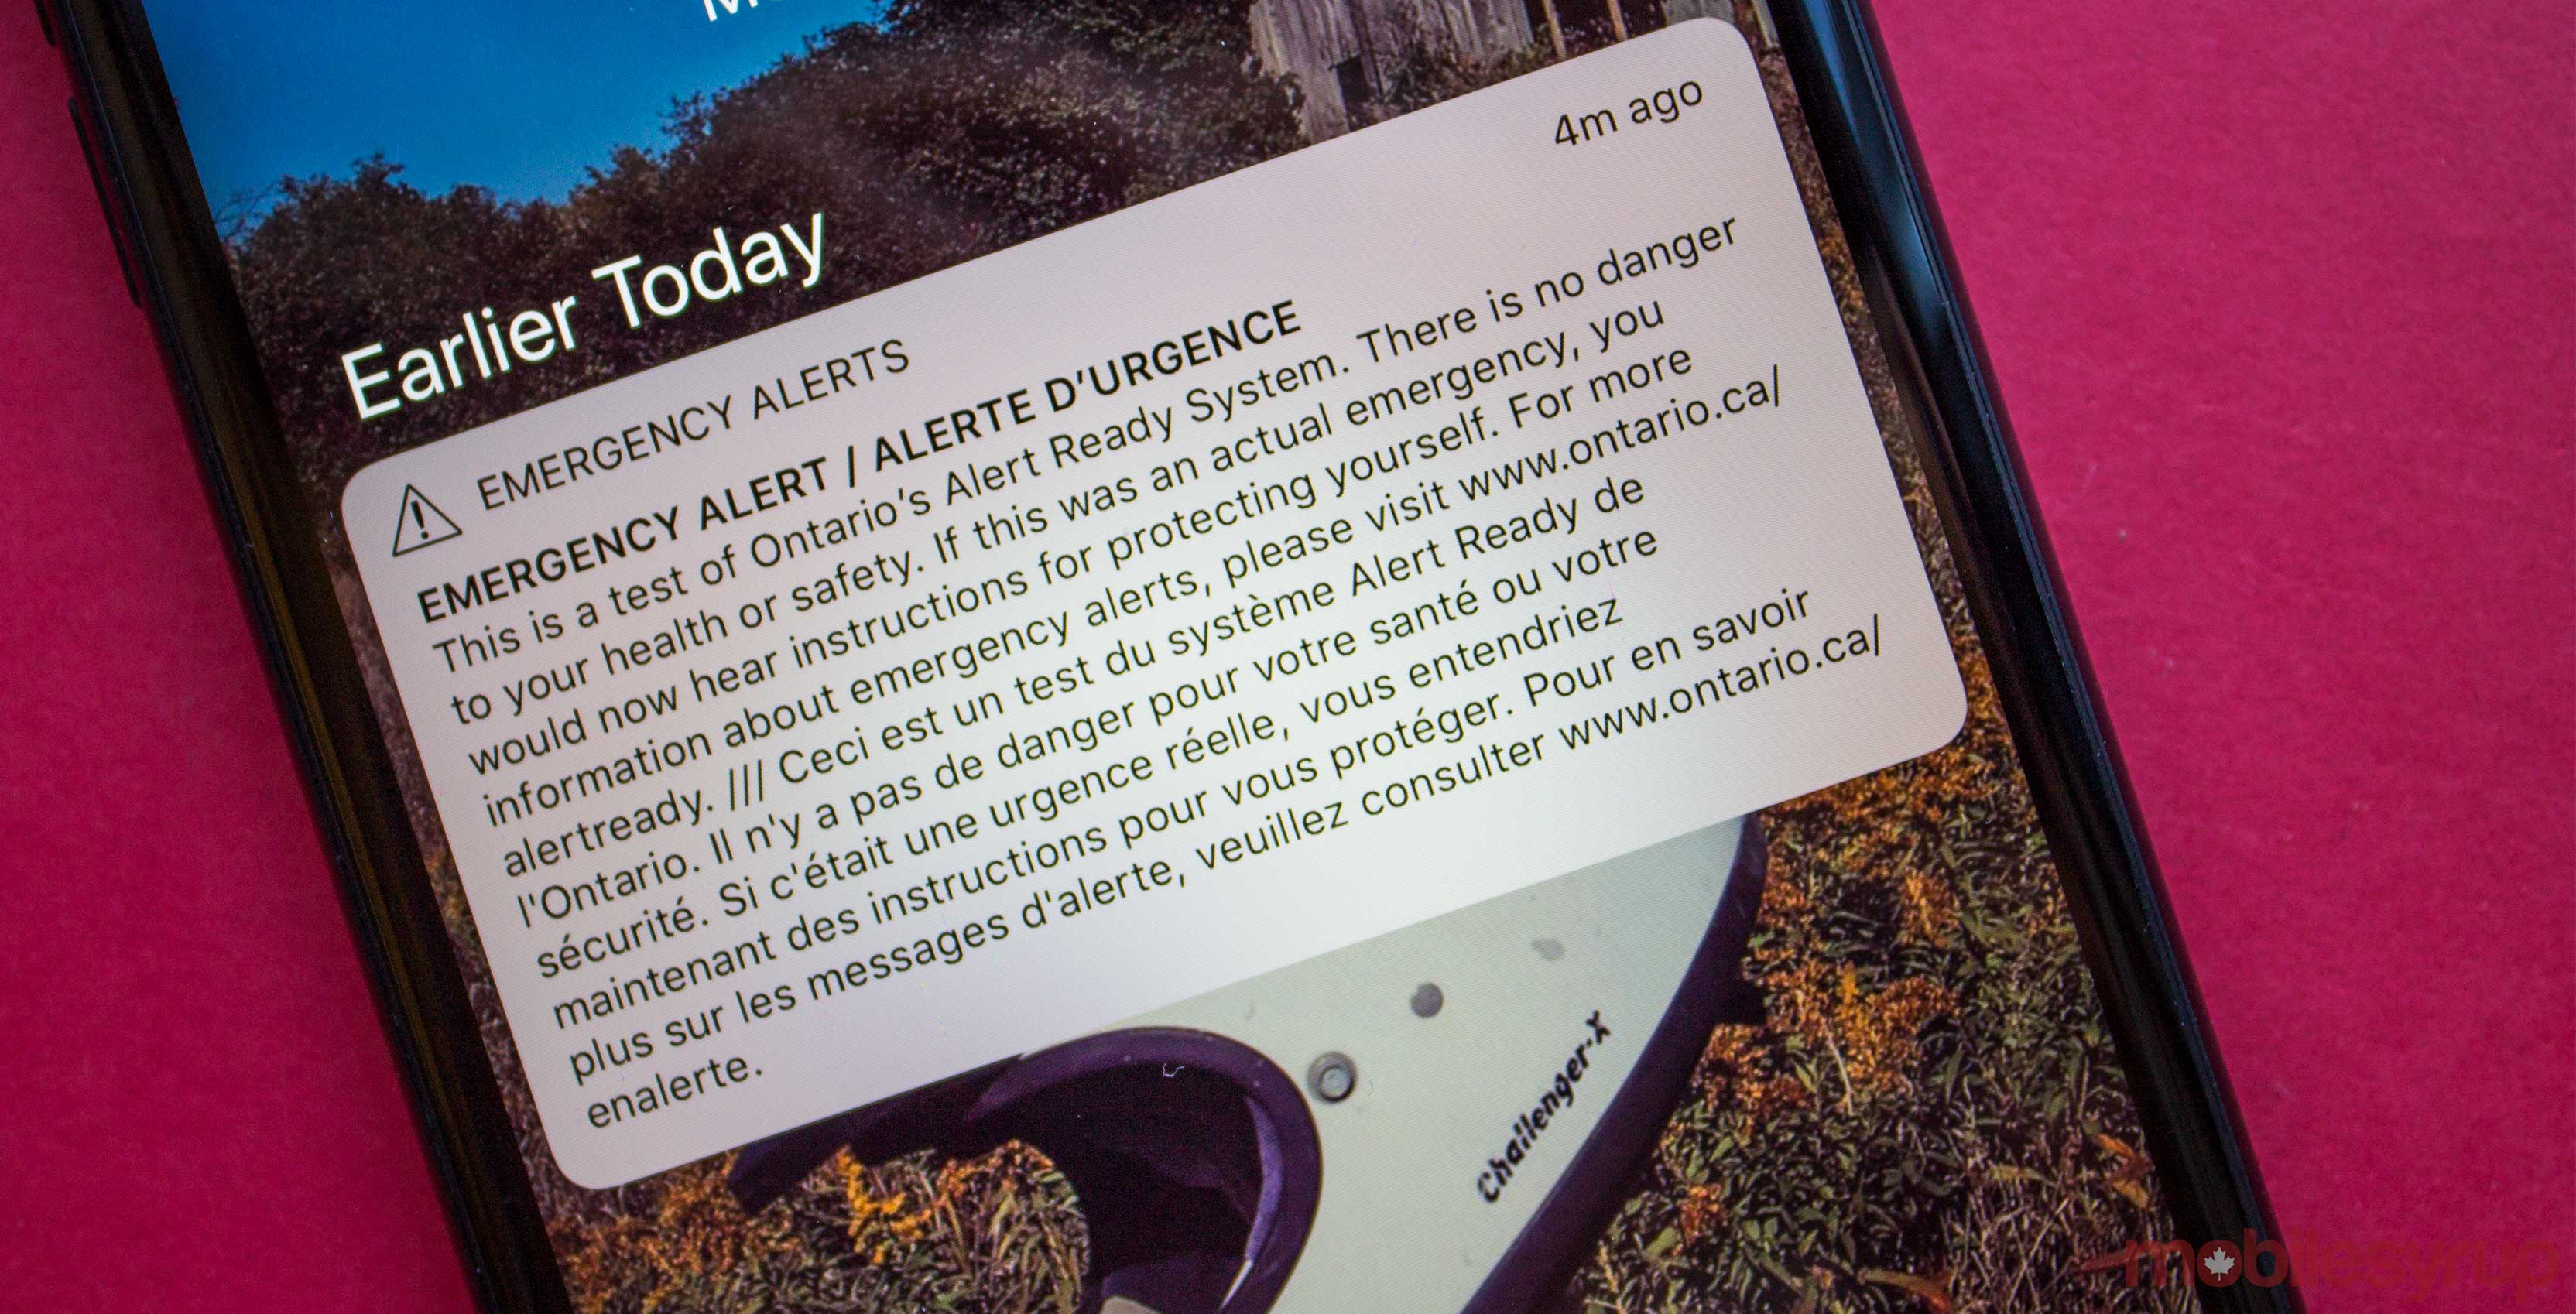 CRTC emergency alert